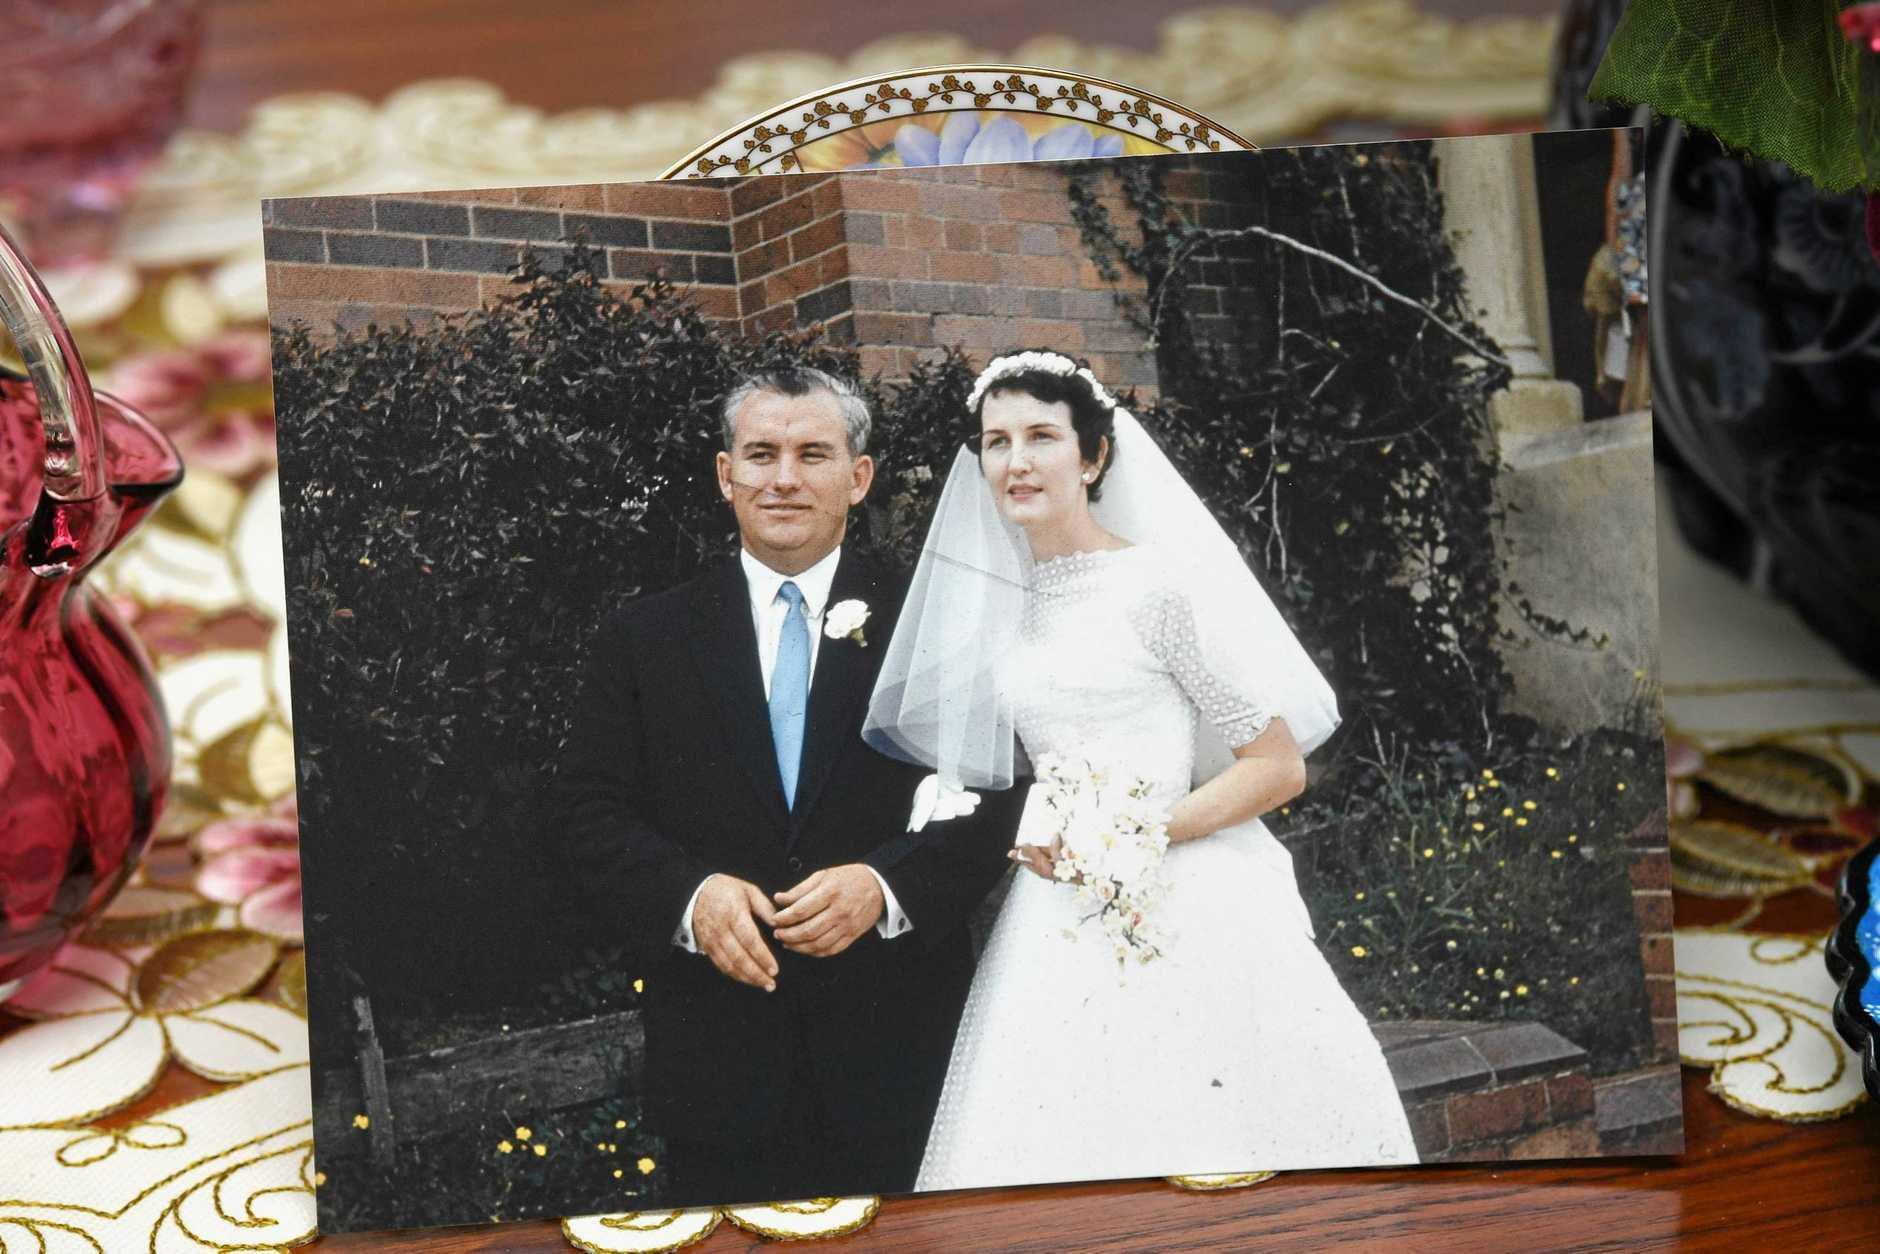 Patrick and Enid Carrol wedding photo